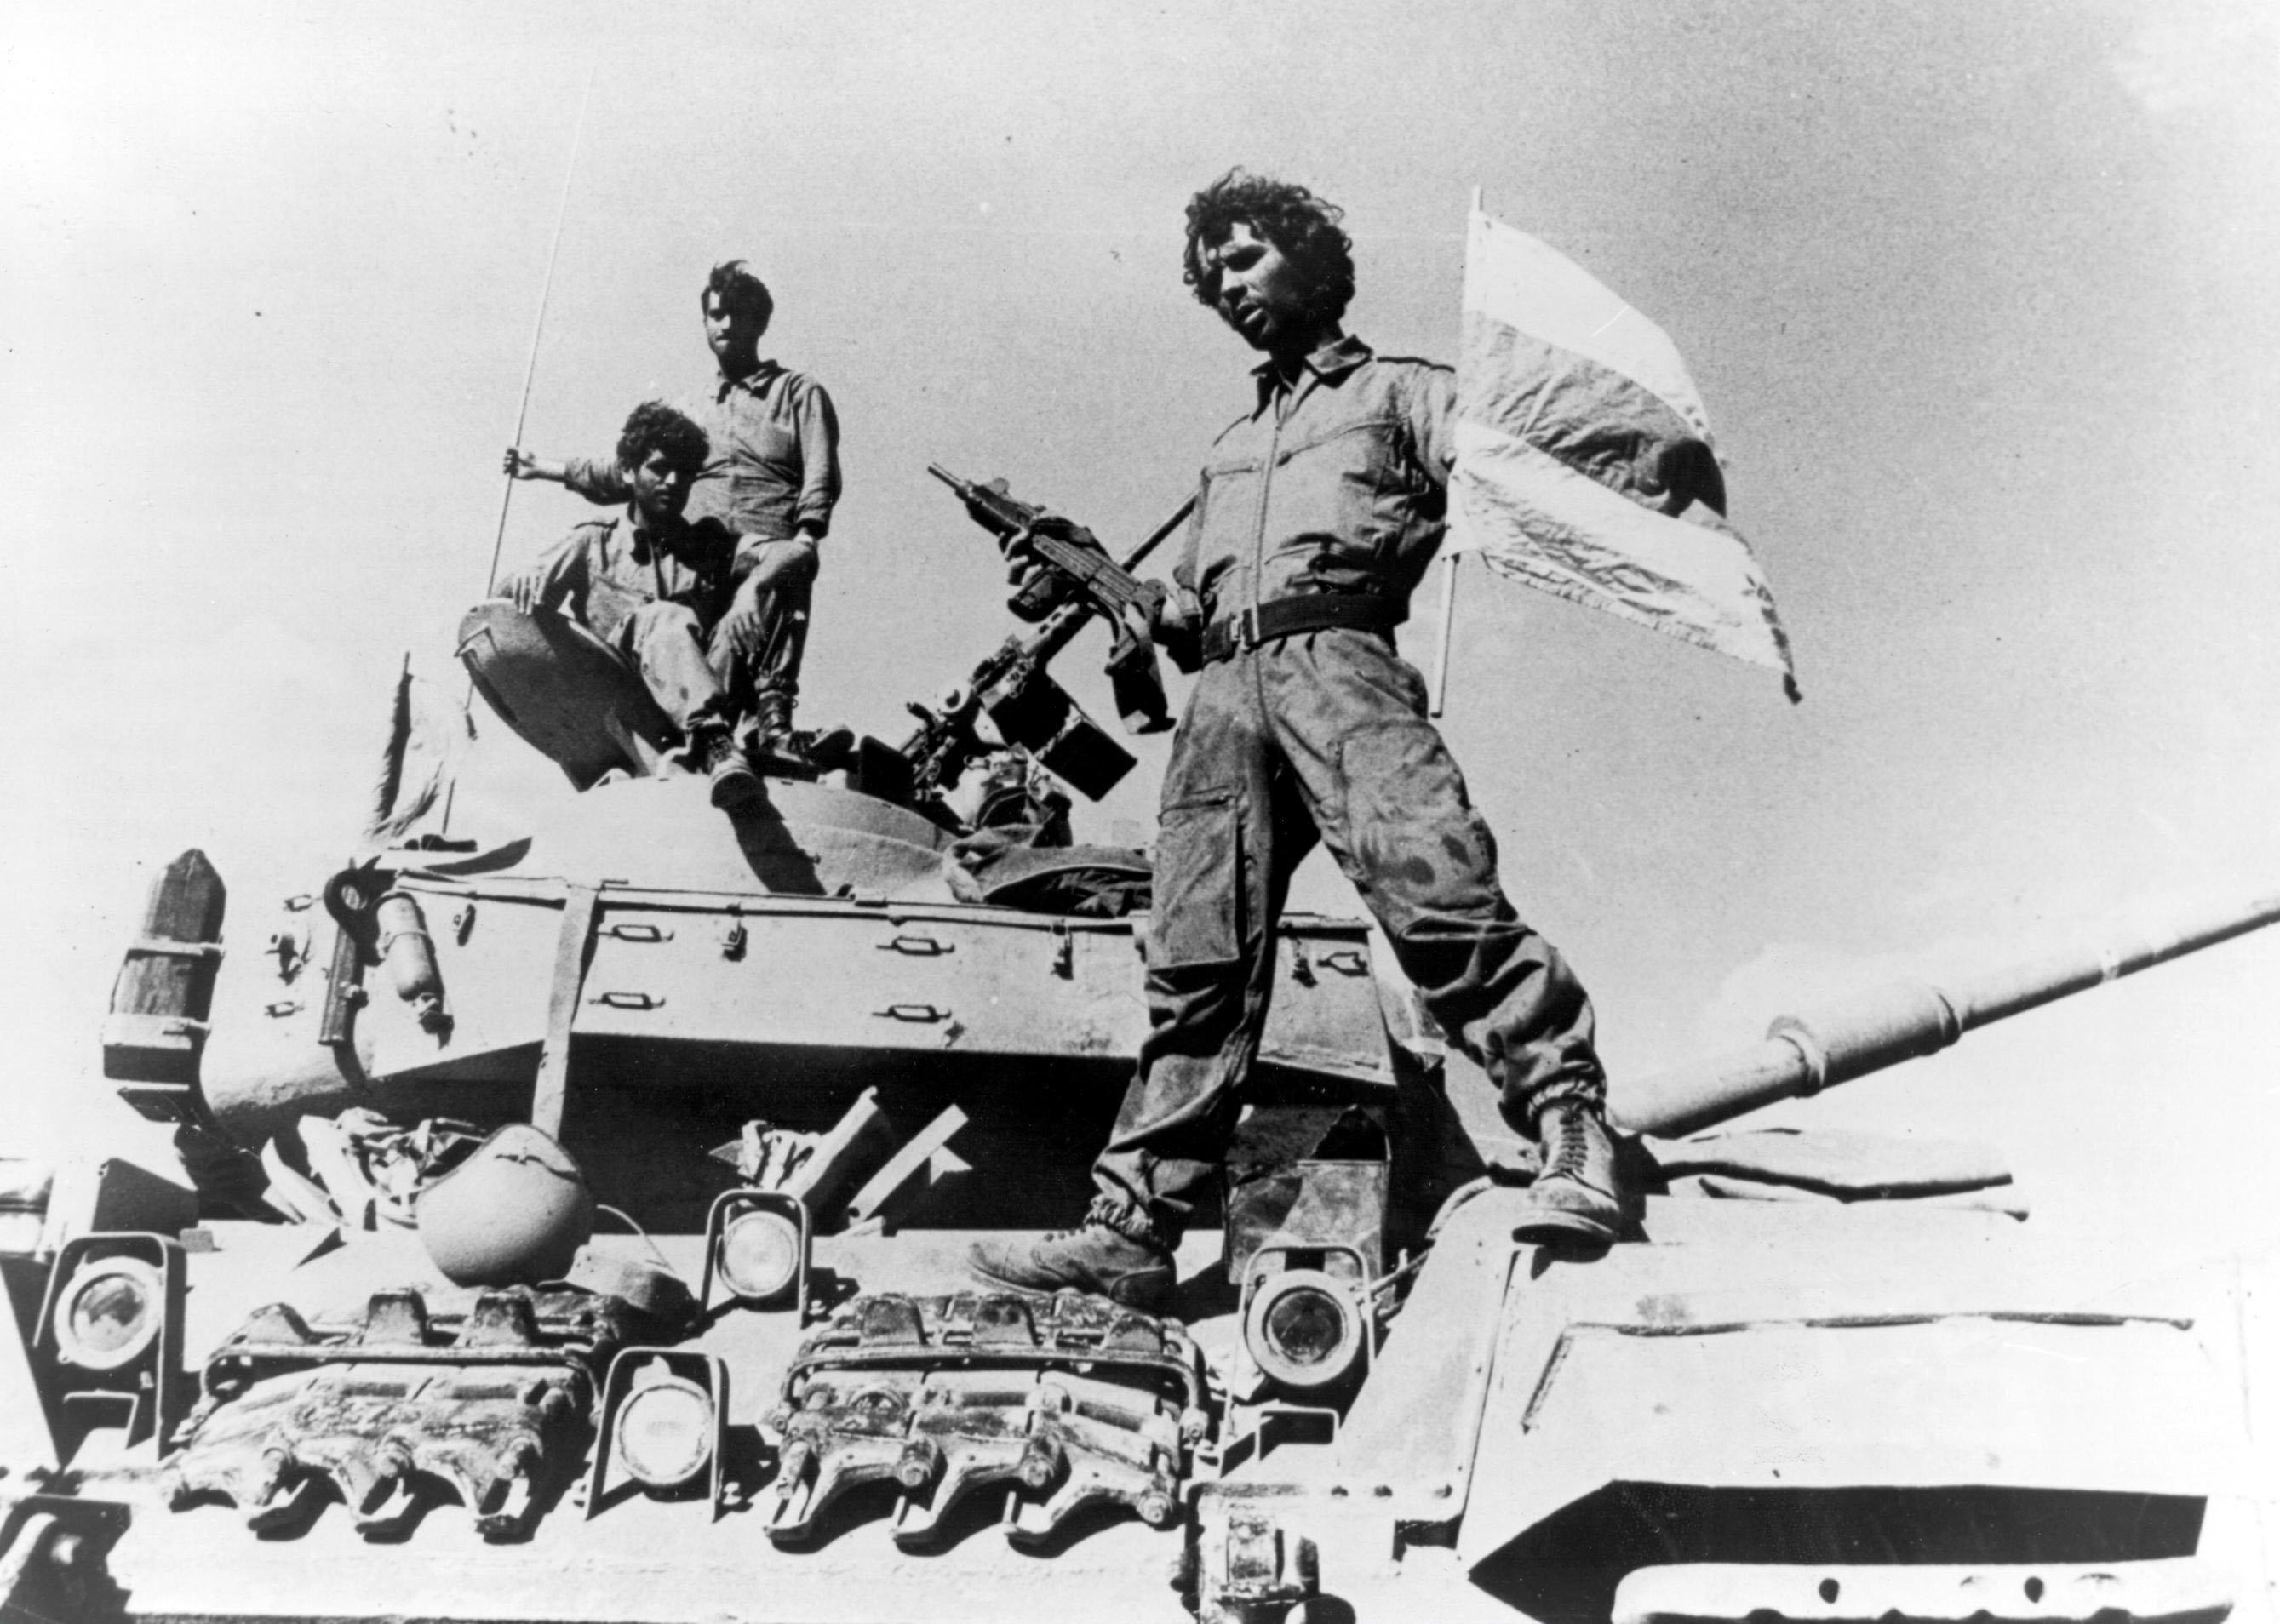 Image [Yom Kippur War - An Israeli soldier on a tank]